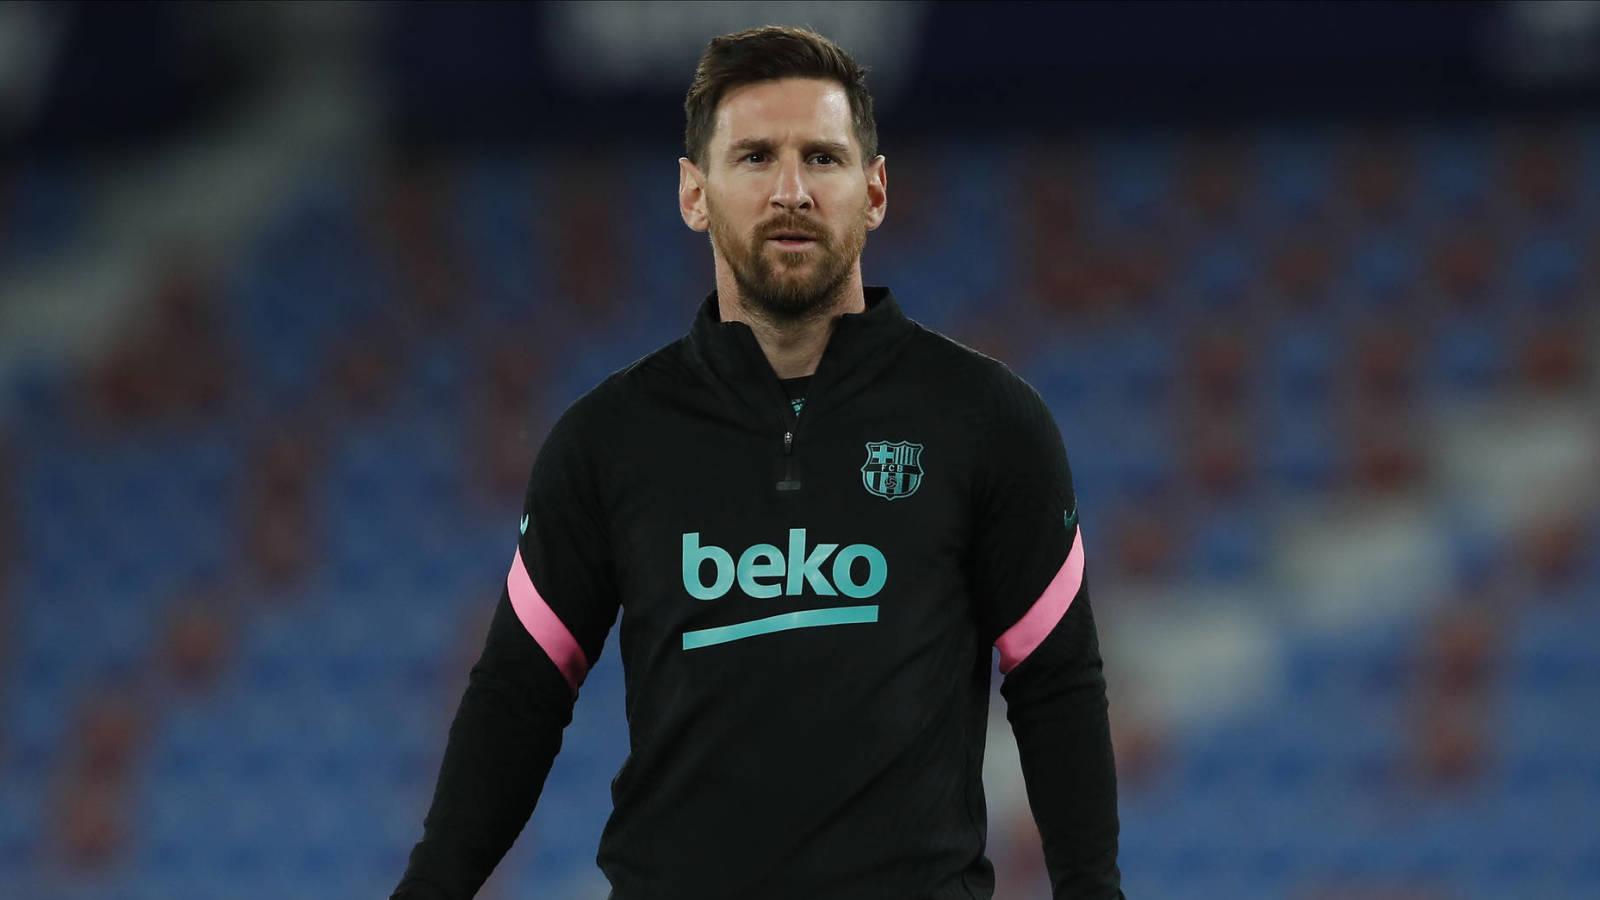 Paris Saint-Germain emerges as favorite to sign Lionel Messi